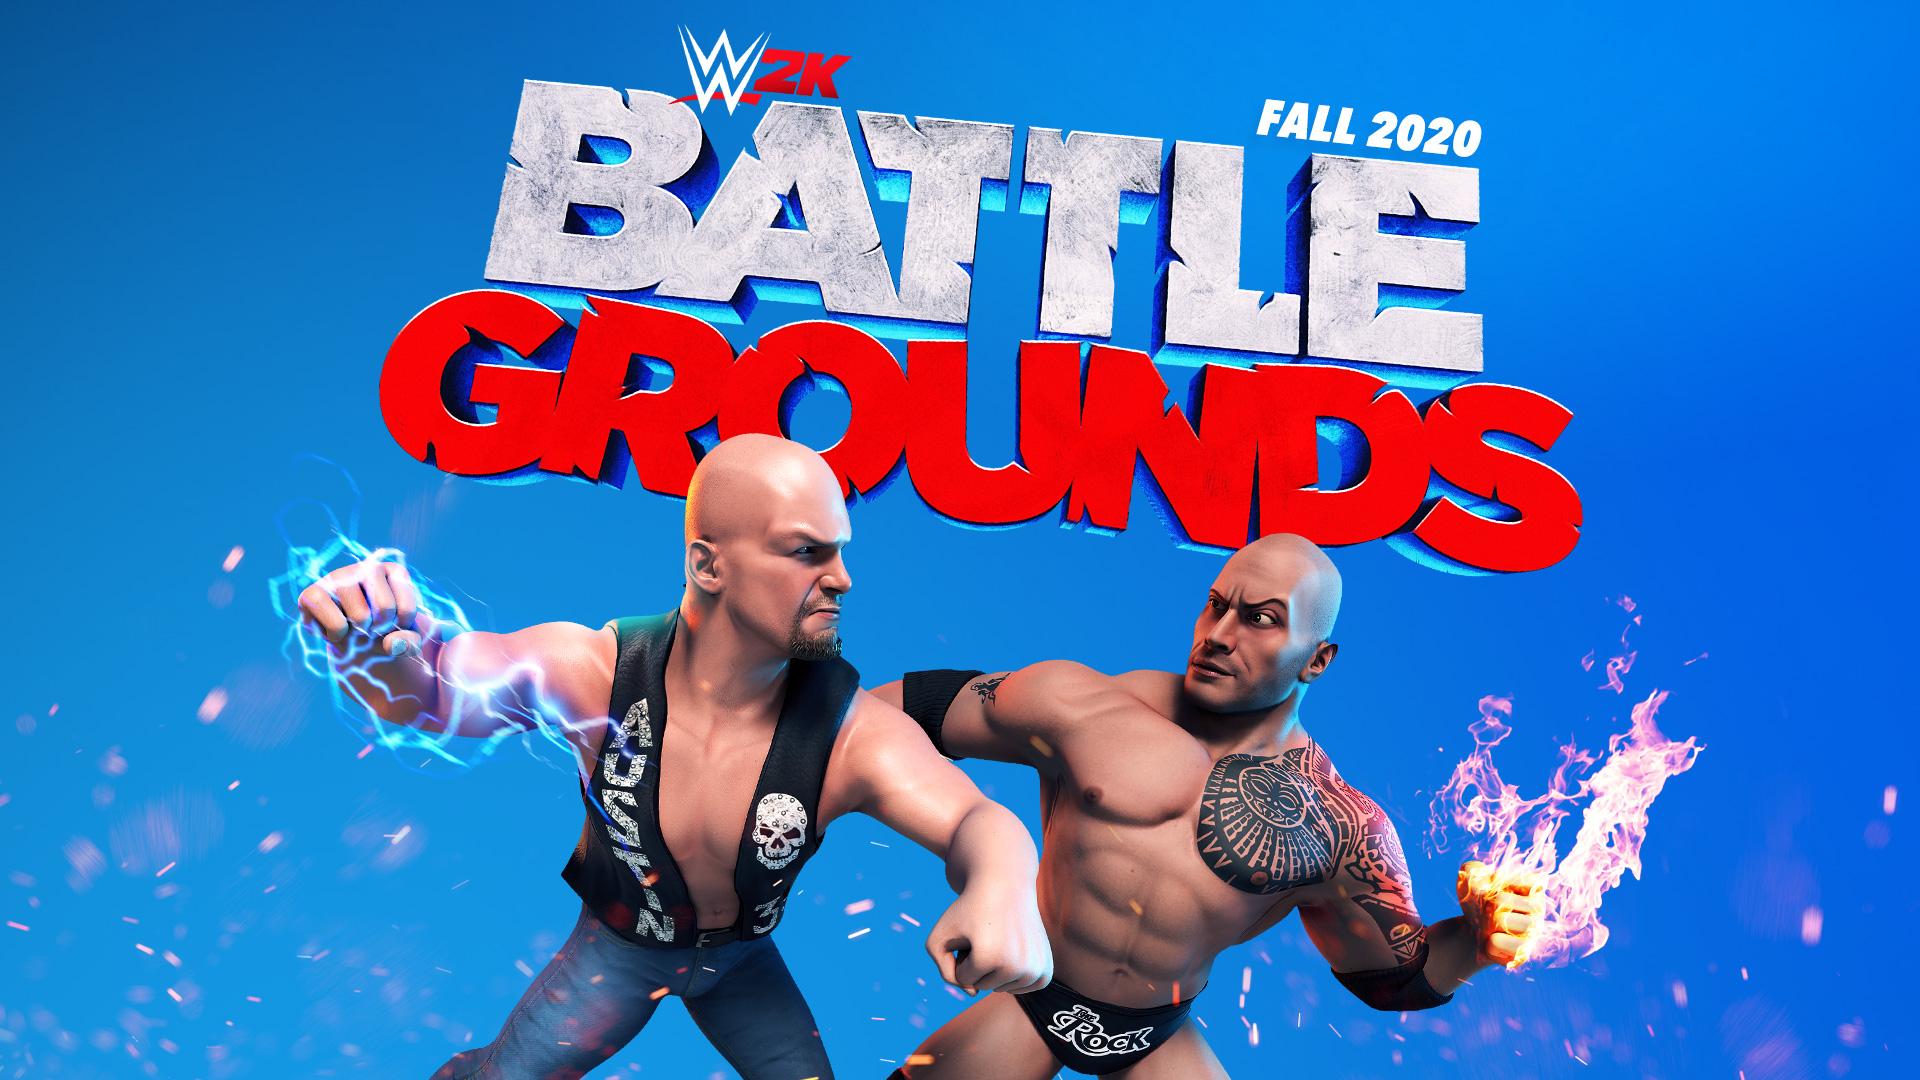 Q版风格热血摔角 《WWE 2K竞技场》将登陆全平台